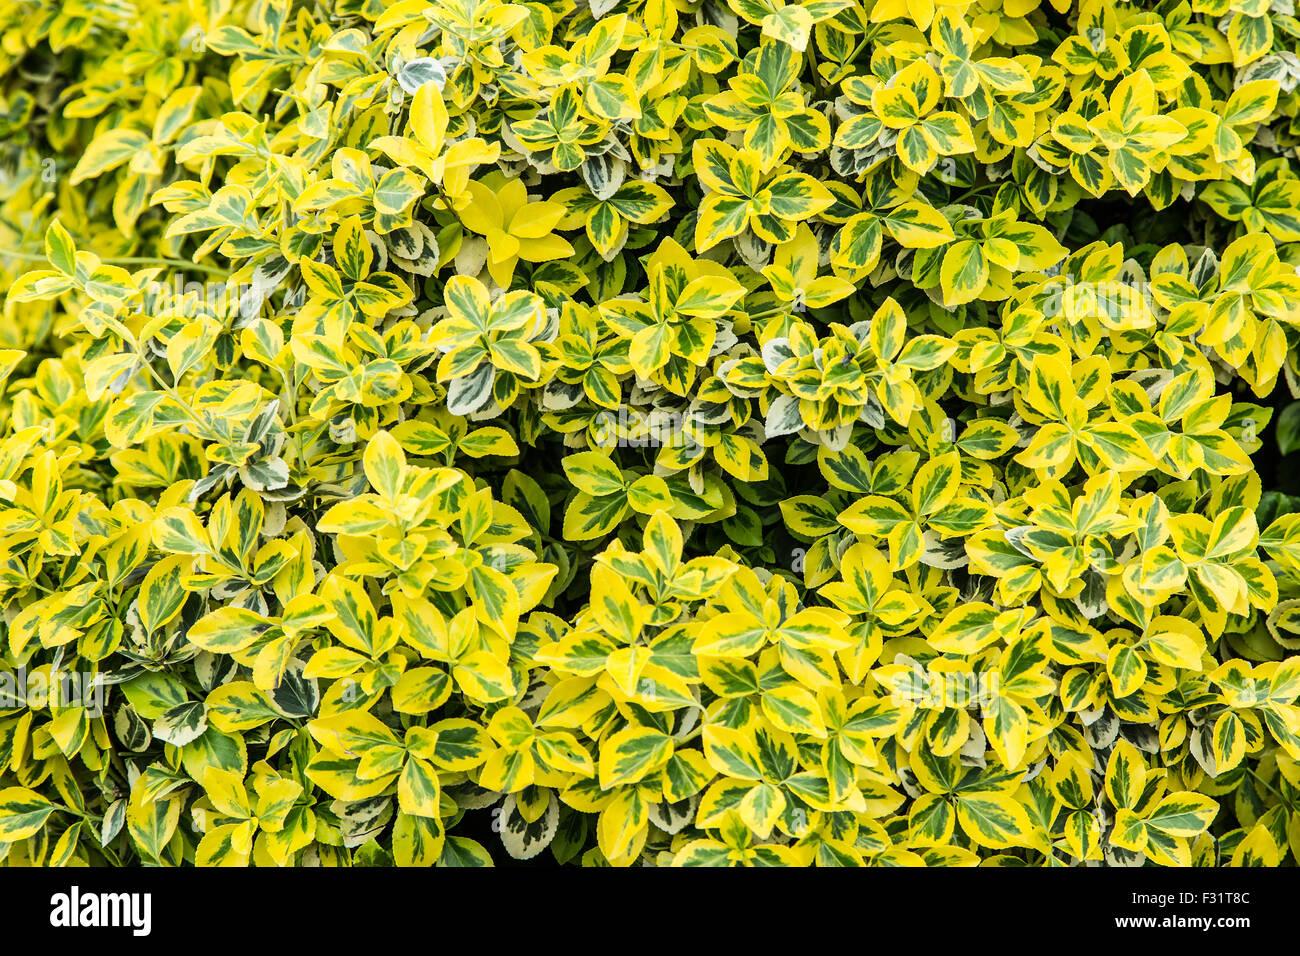 Colorful bush leaves. Close-up shot. Nature background. - Stock Image